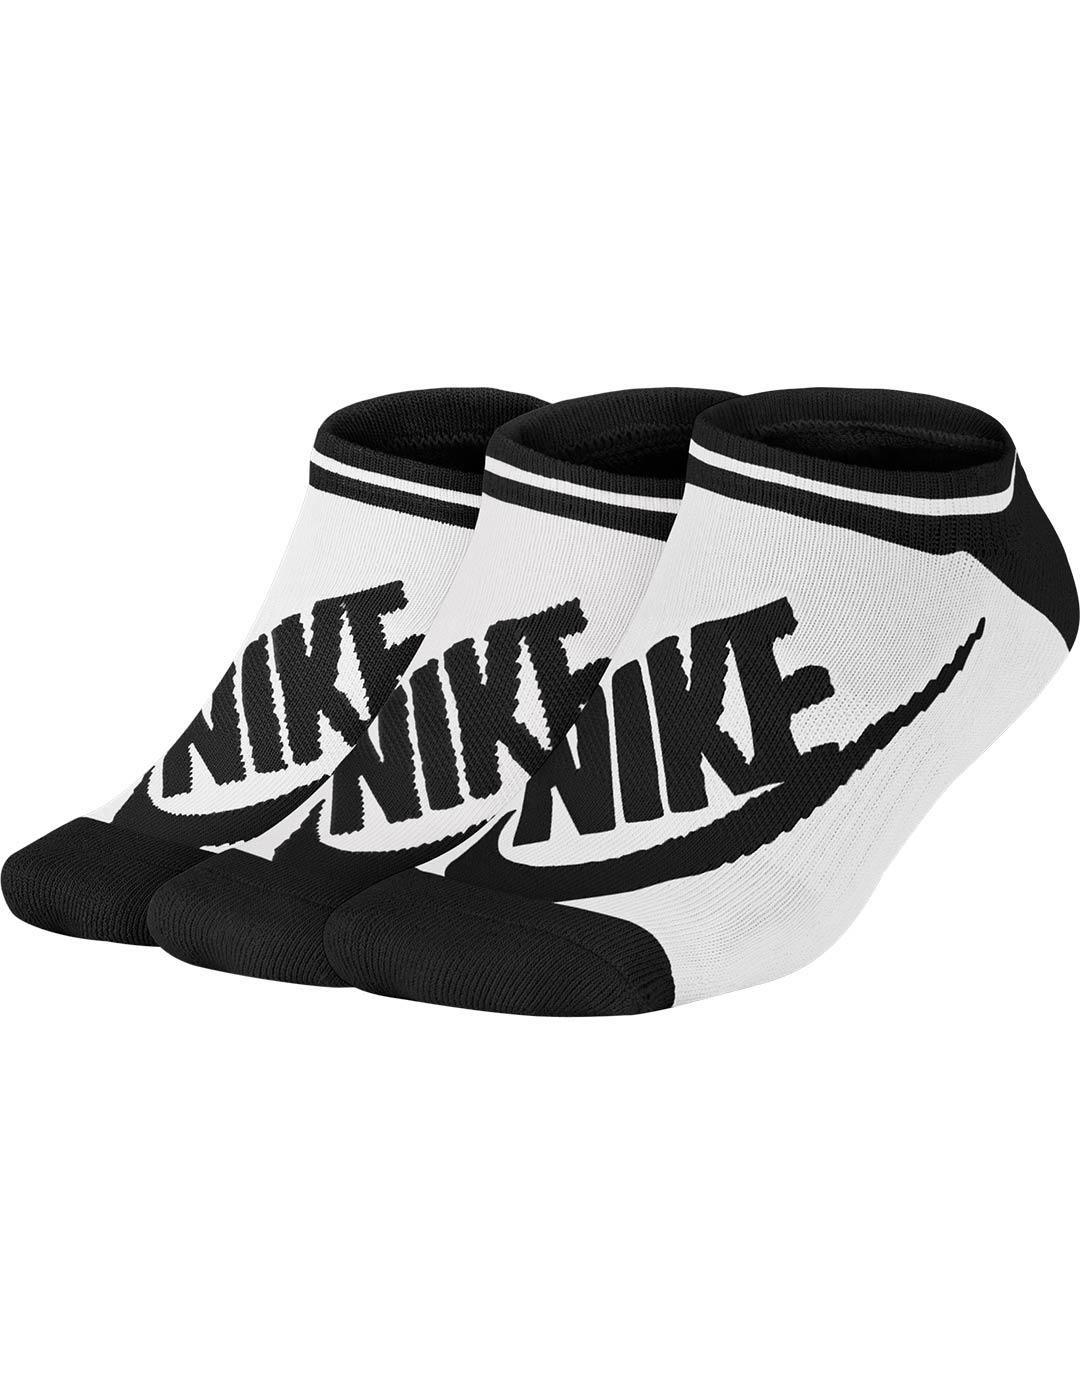 Nike Dri FIT Cushion No Show Socks Image 3